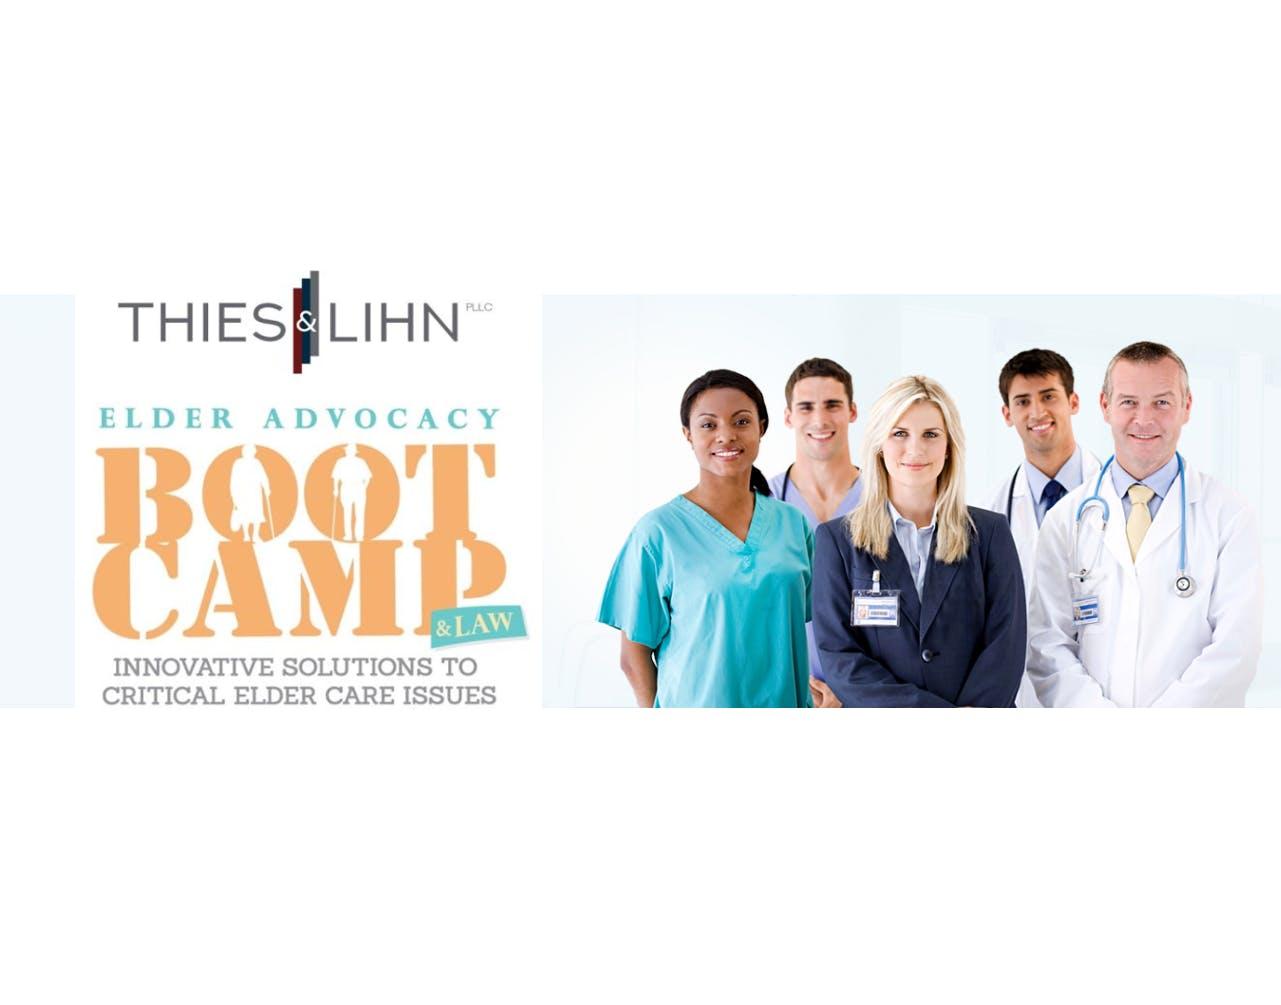 Thies & Lihn, PLLC - 2019 Elder Advocacy & Law Boot Camp